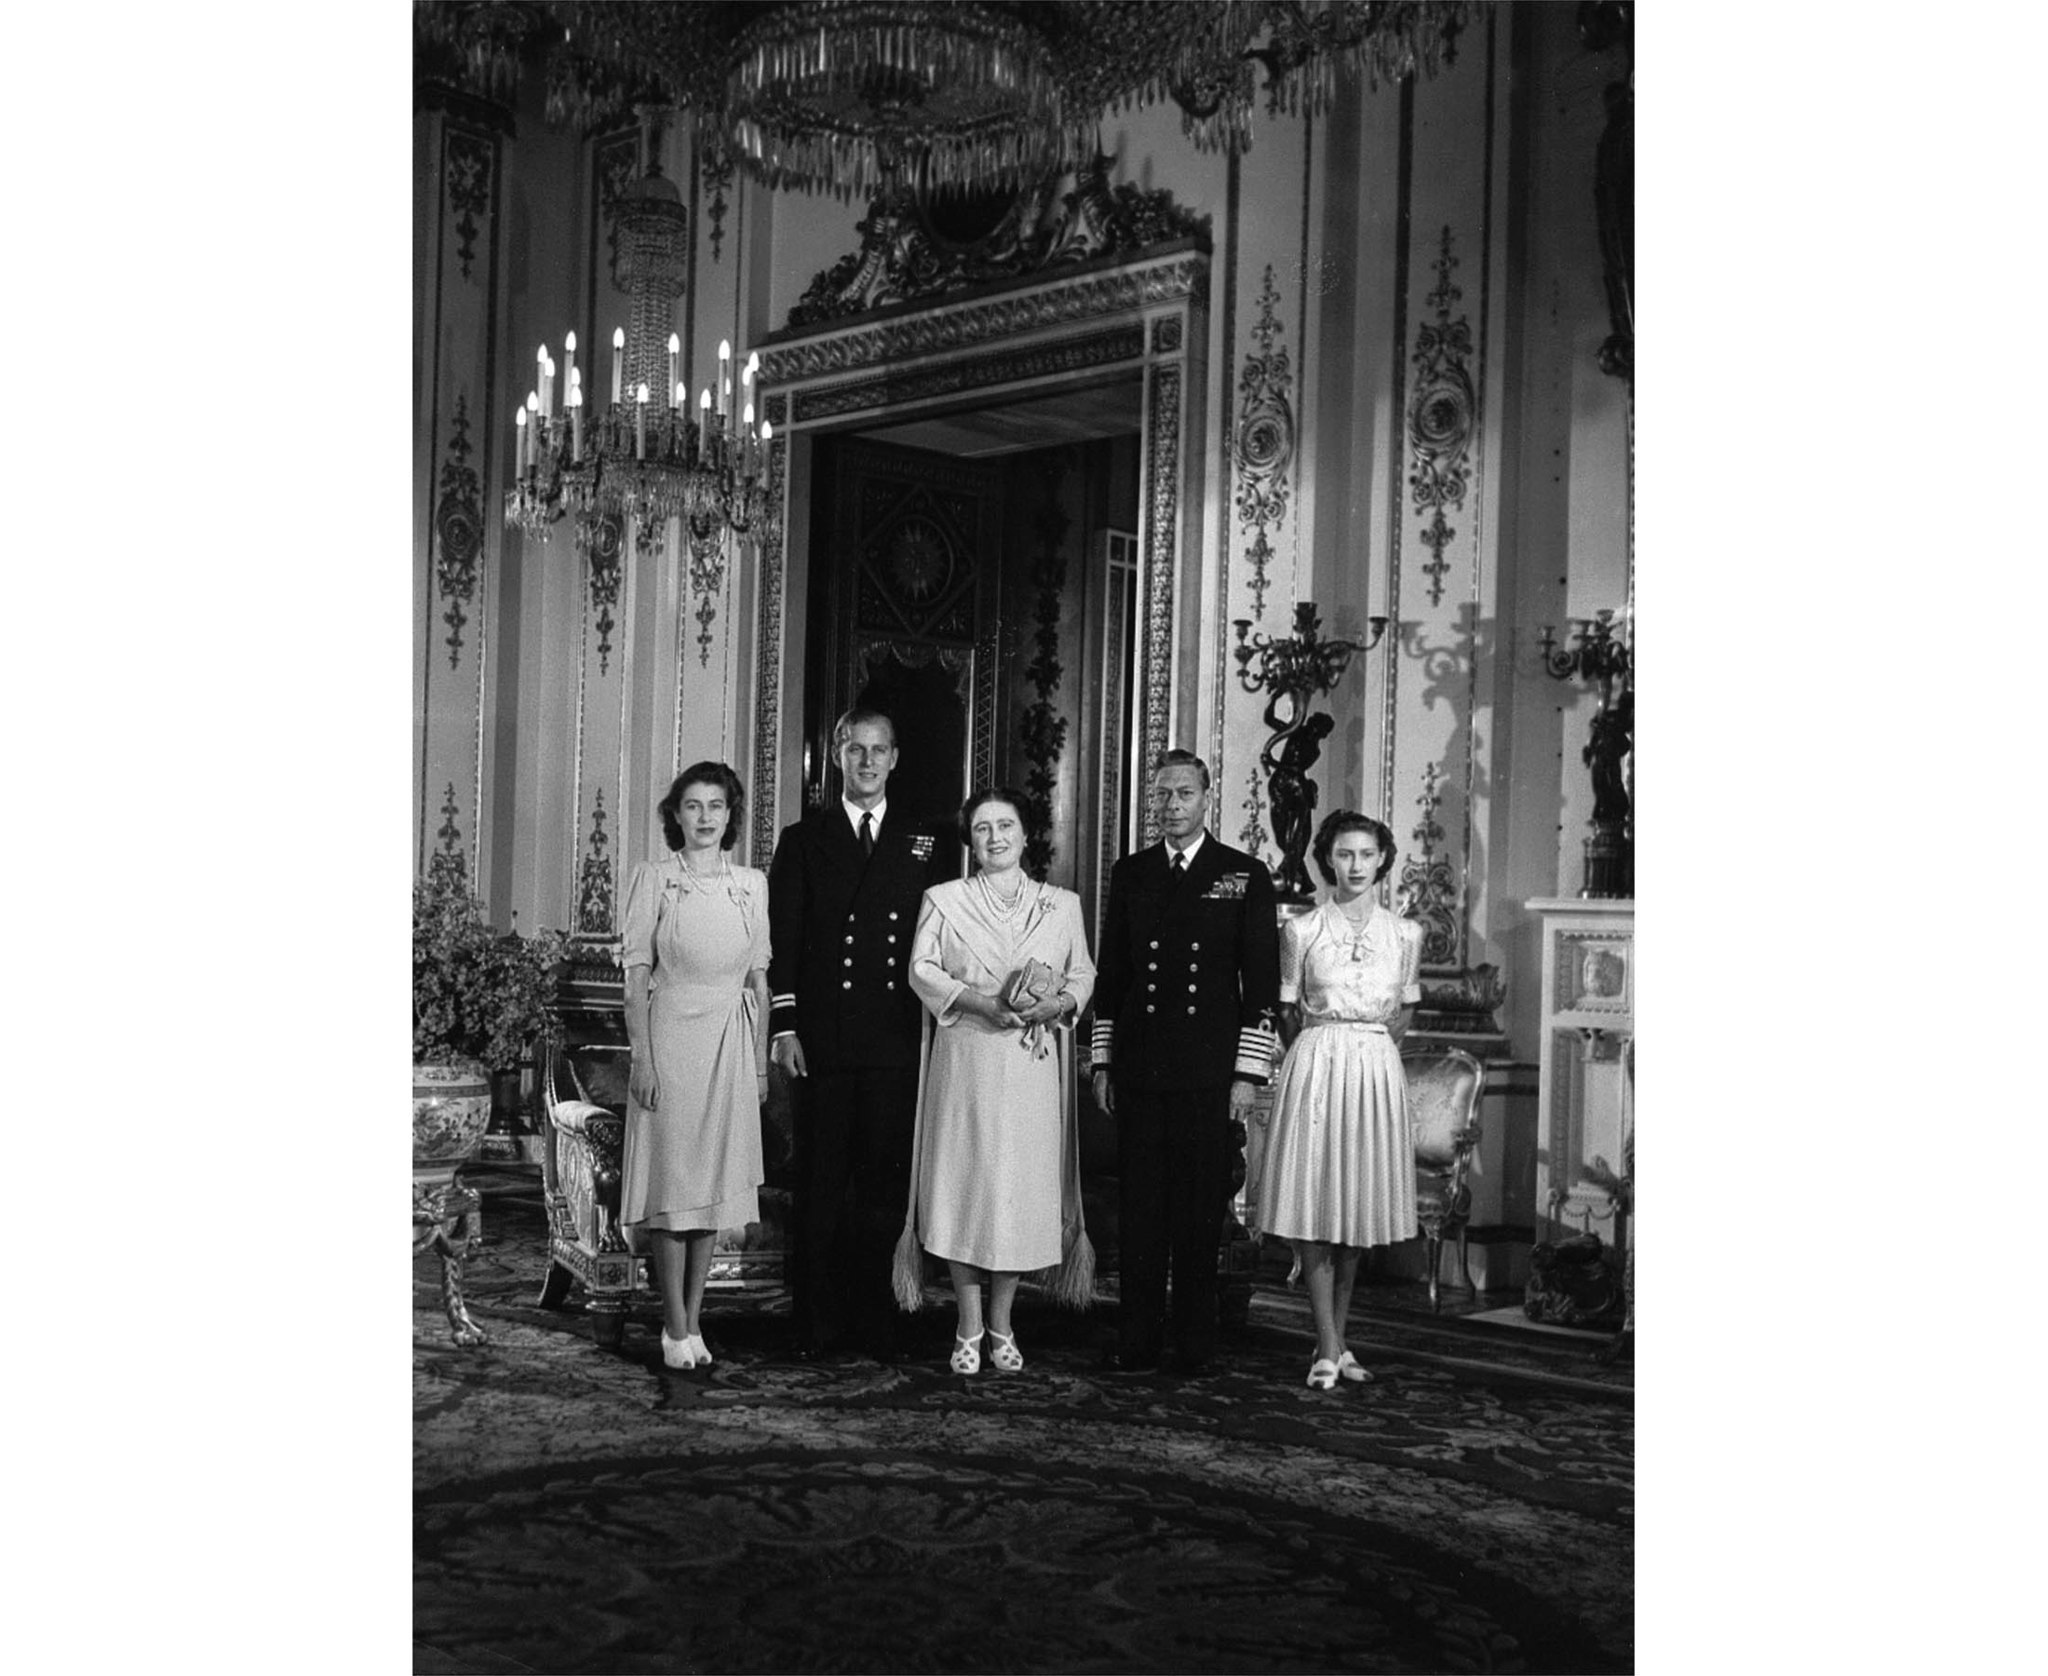 King George VI, Queen Elizabeth, Princess Elizabeth and Princess Margaret